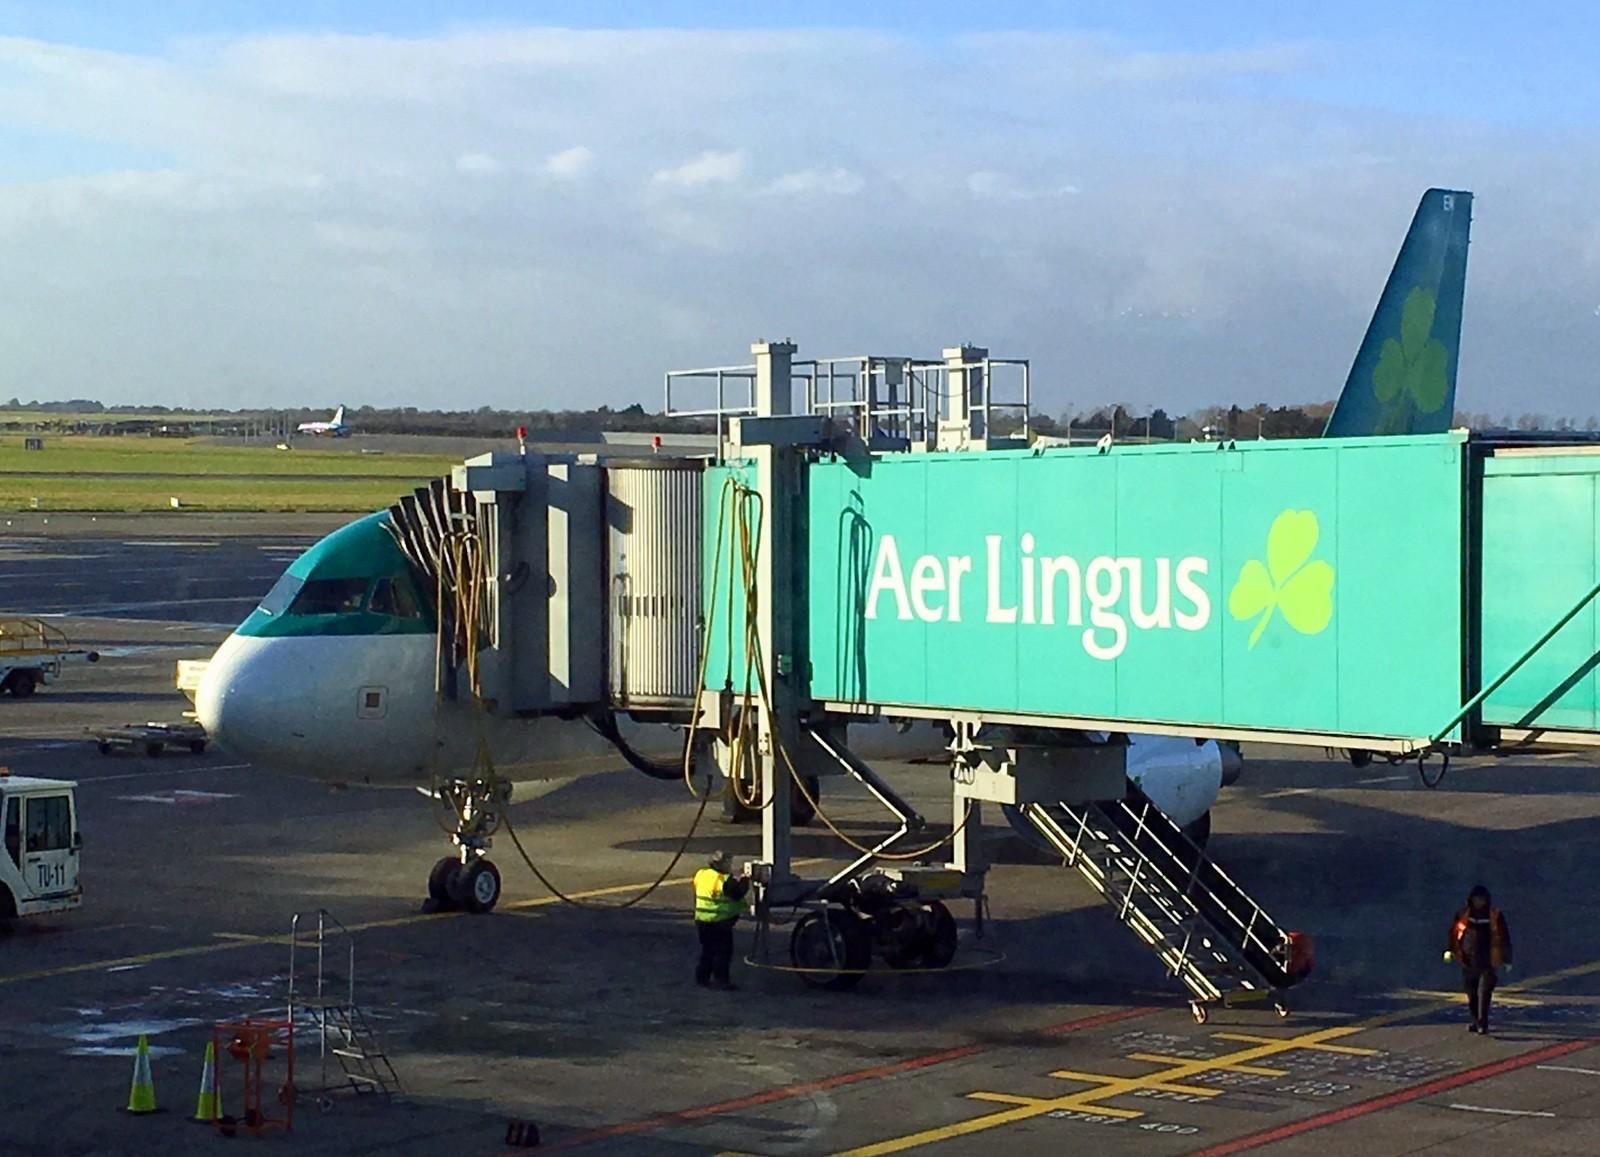 Aer Lingus Dublin